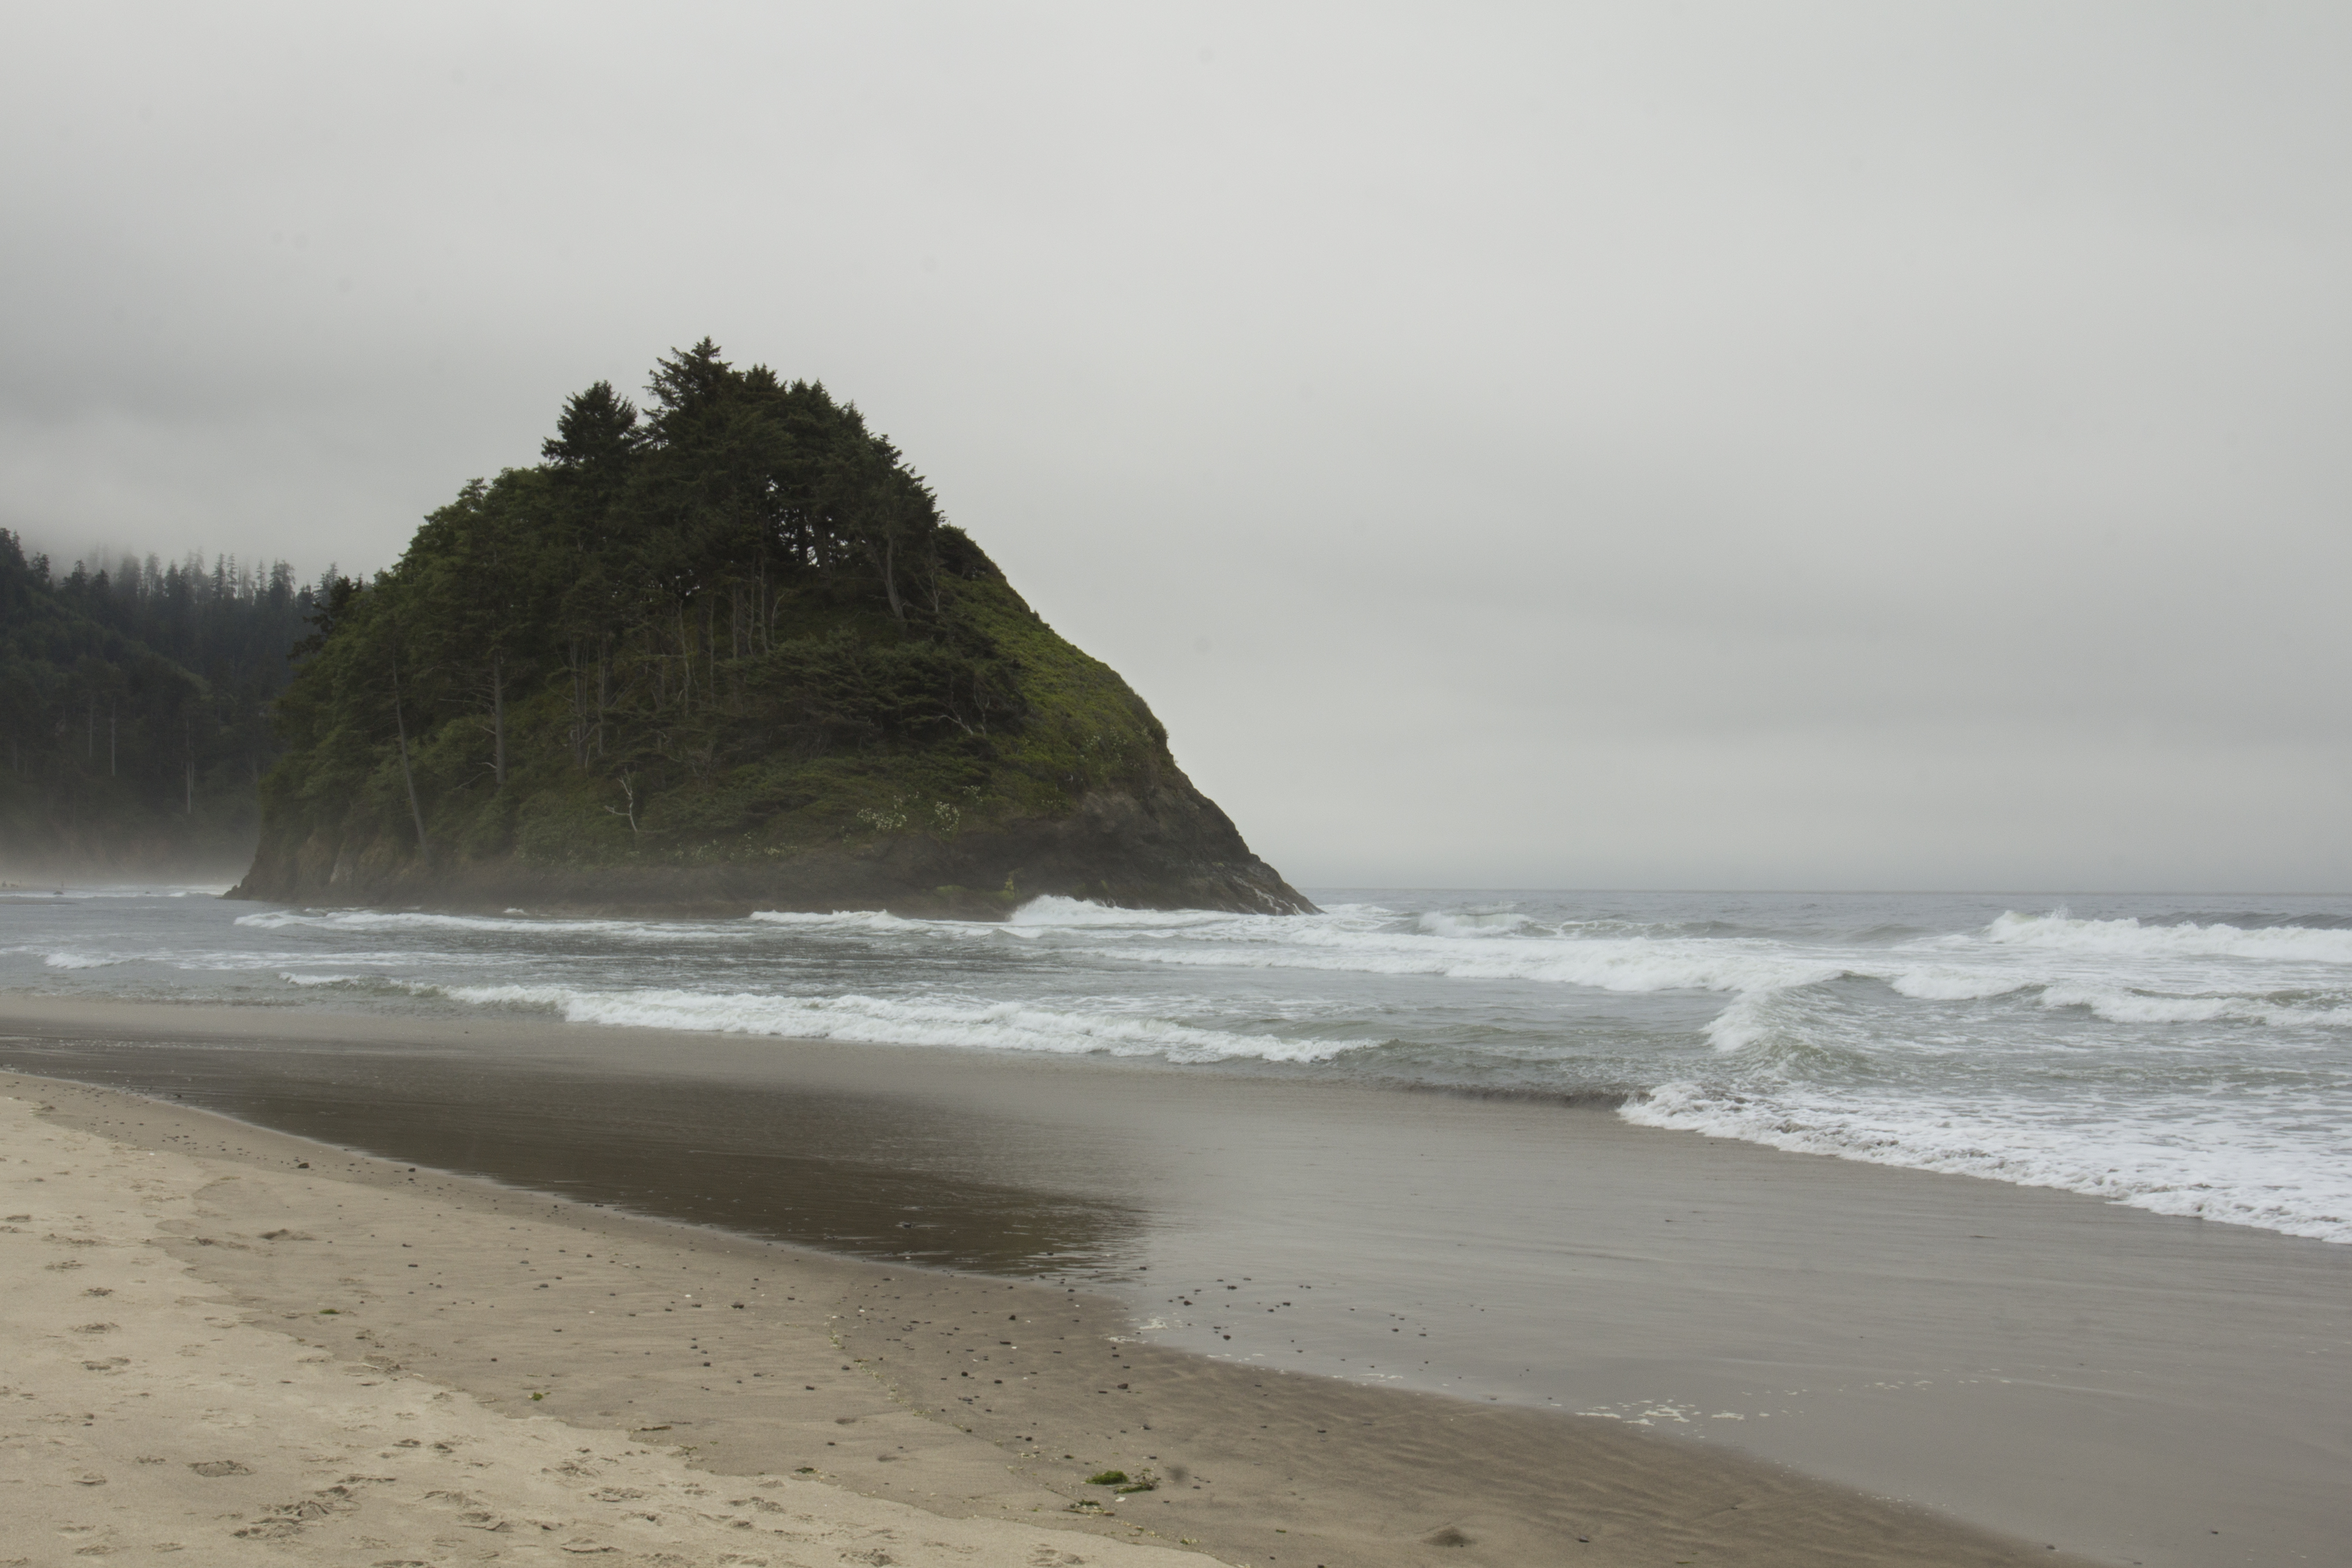 Neskowin beach, oregon photo